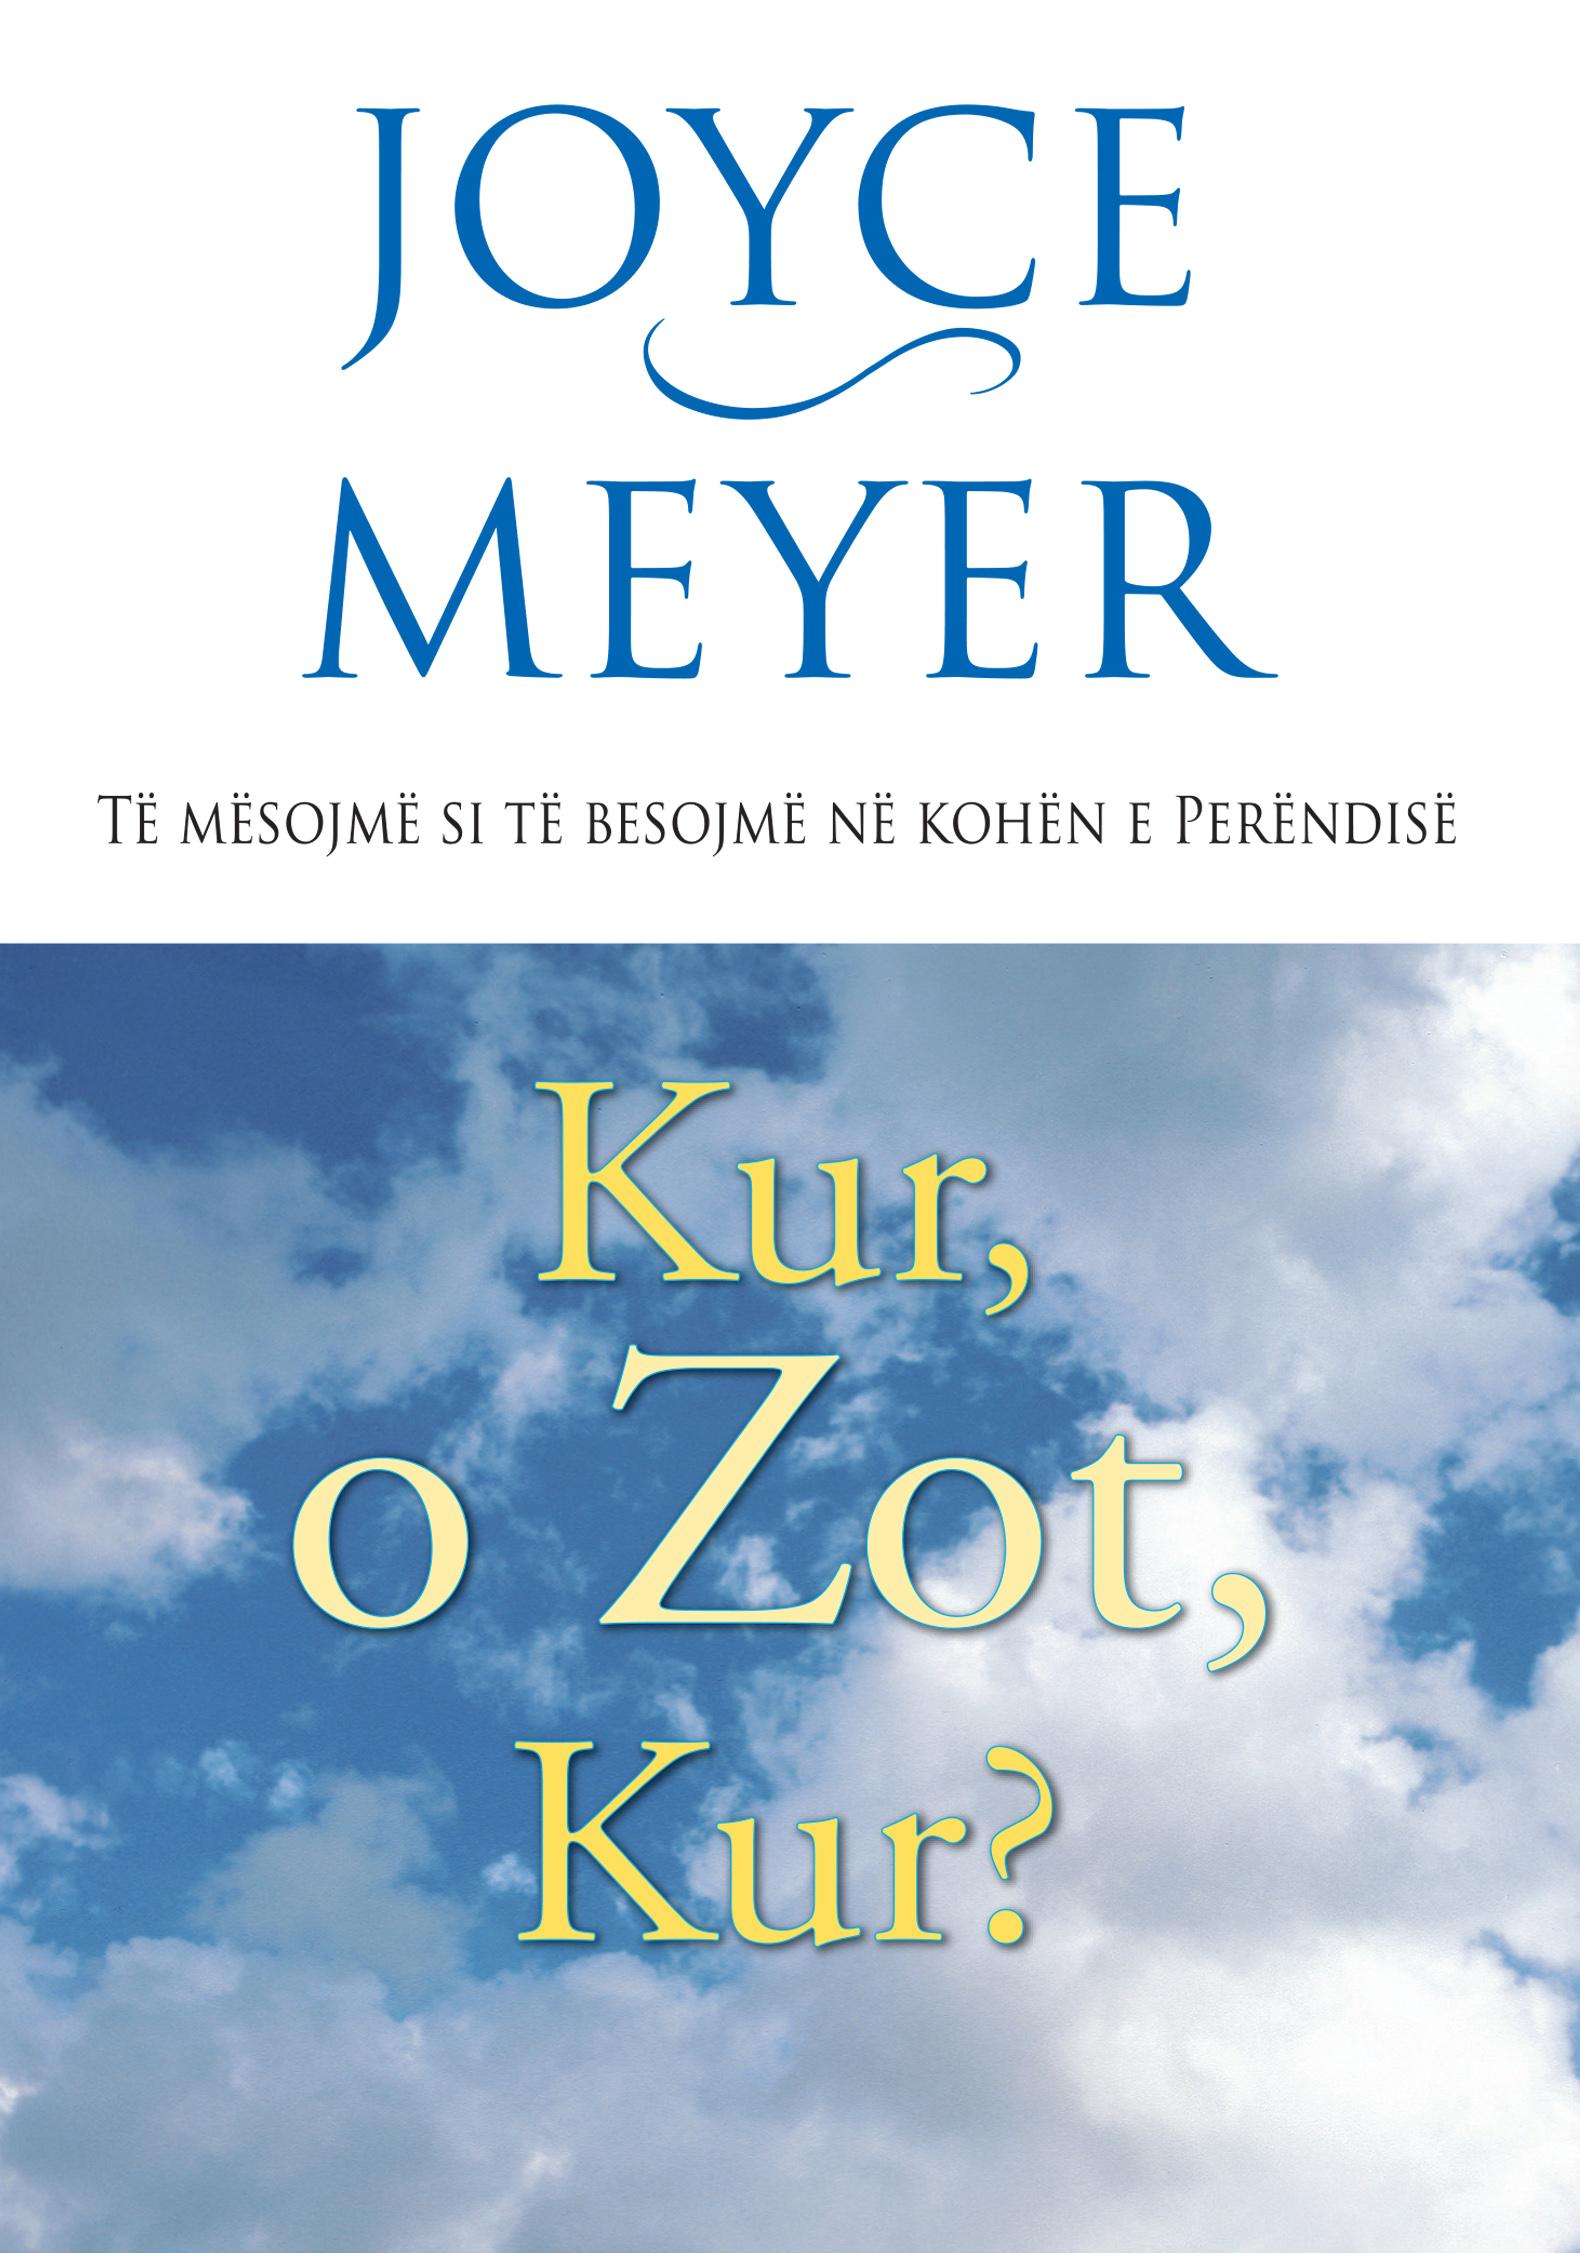 Kur o Zot Kur – Joyce Meyer